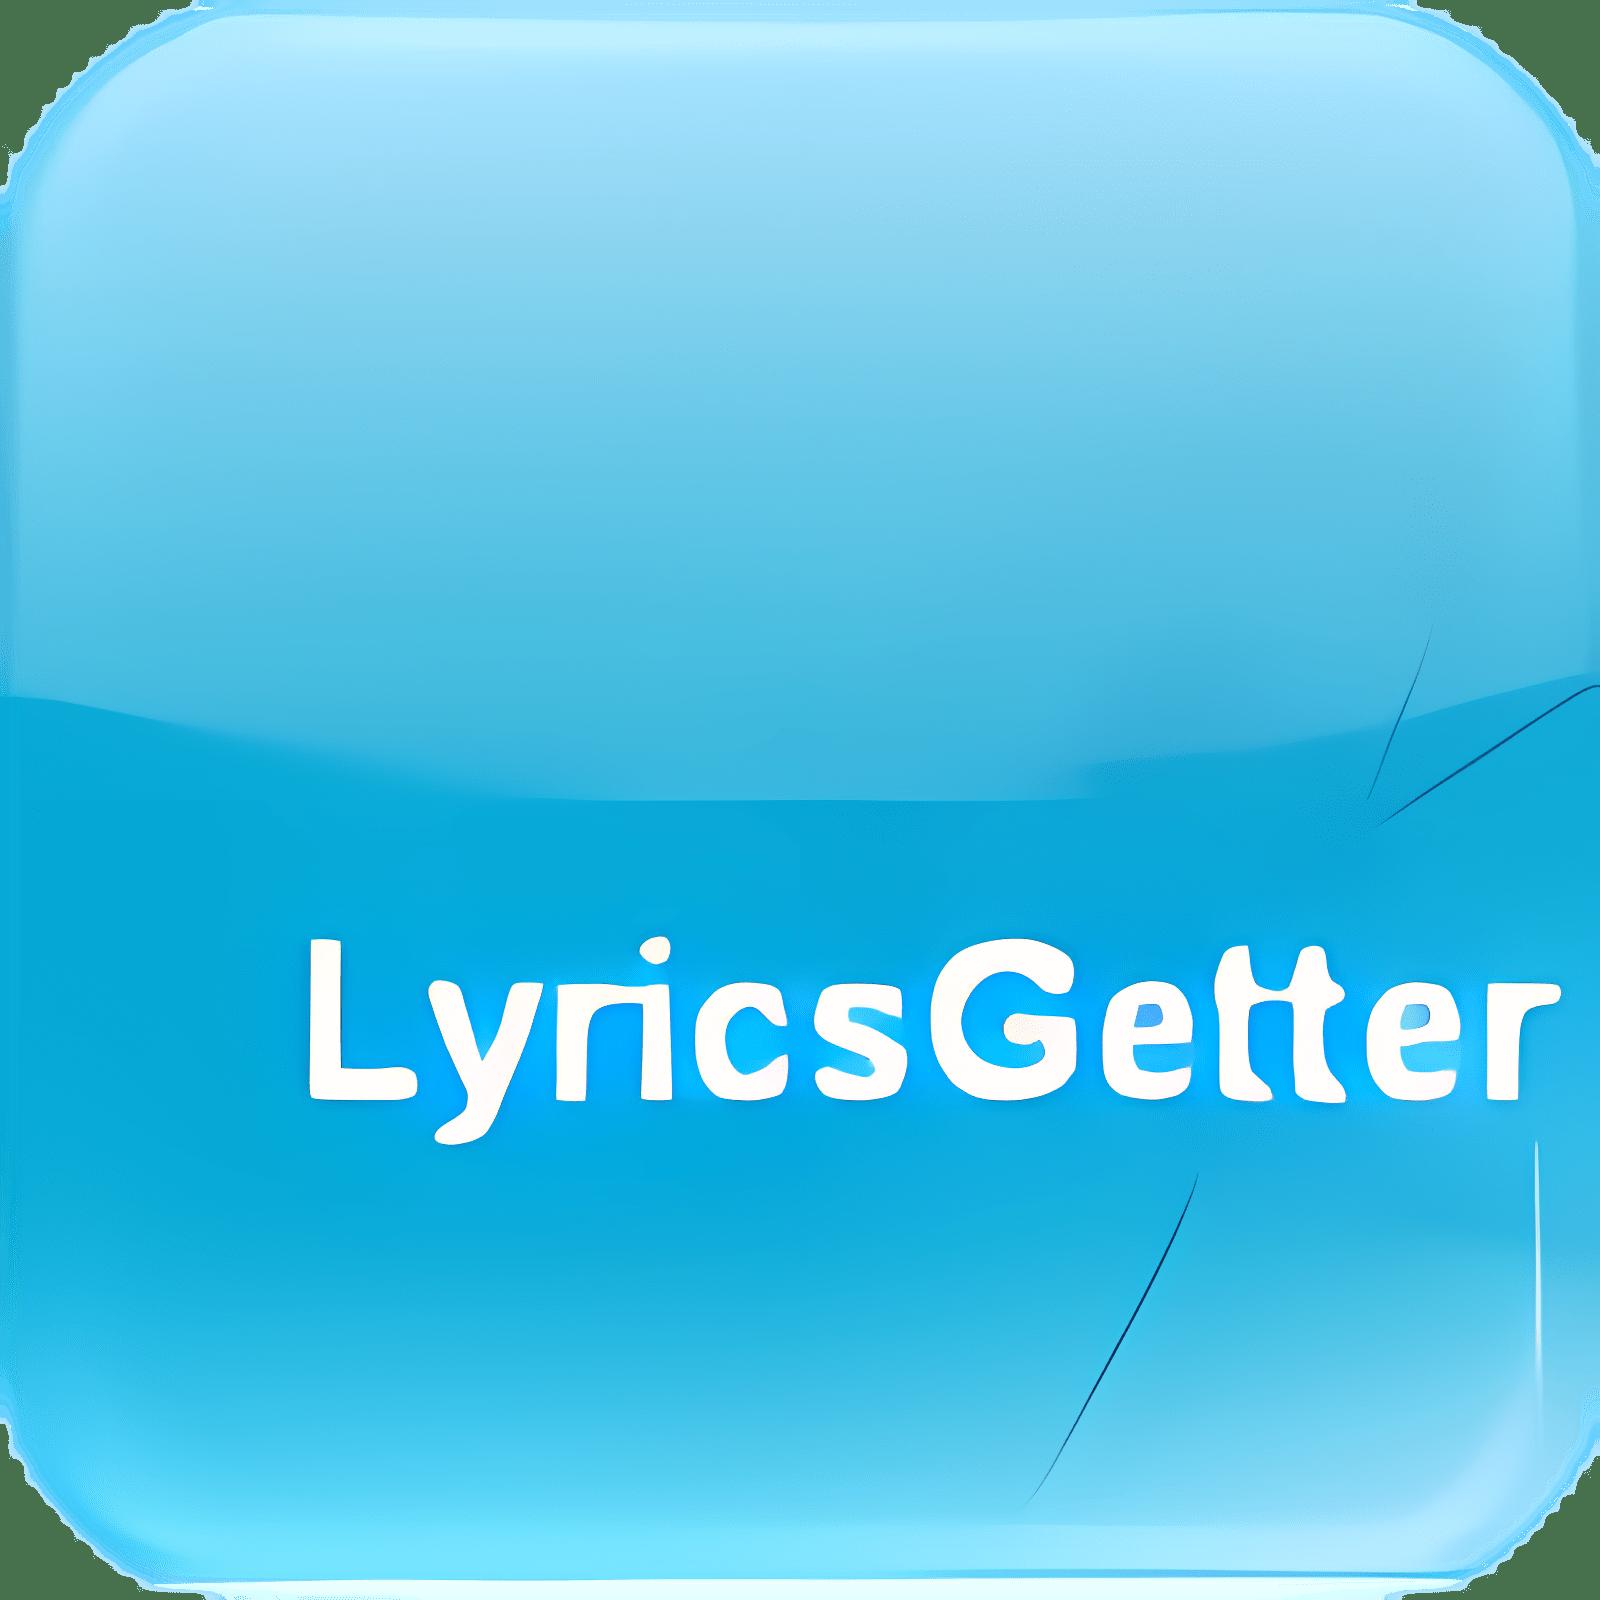 LyricsGetter